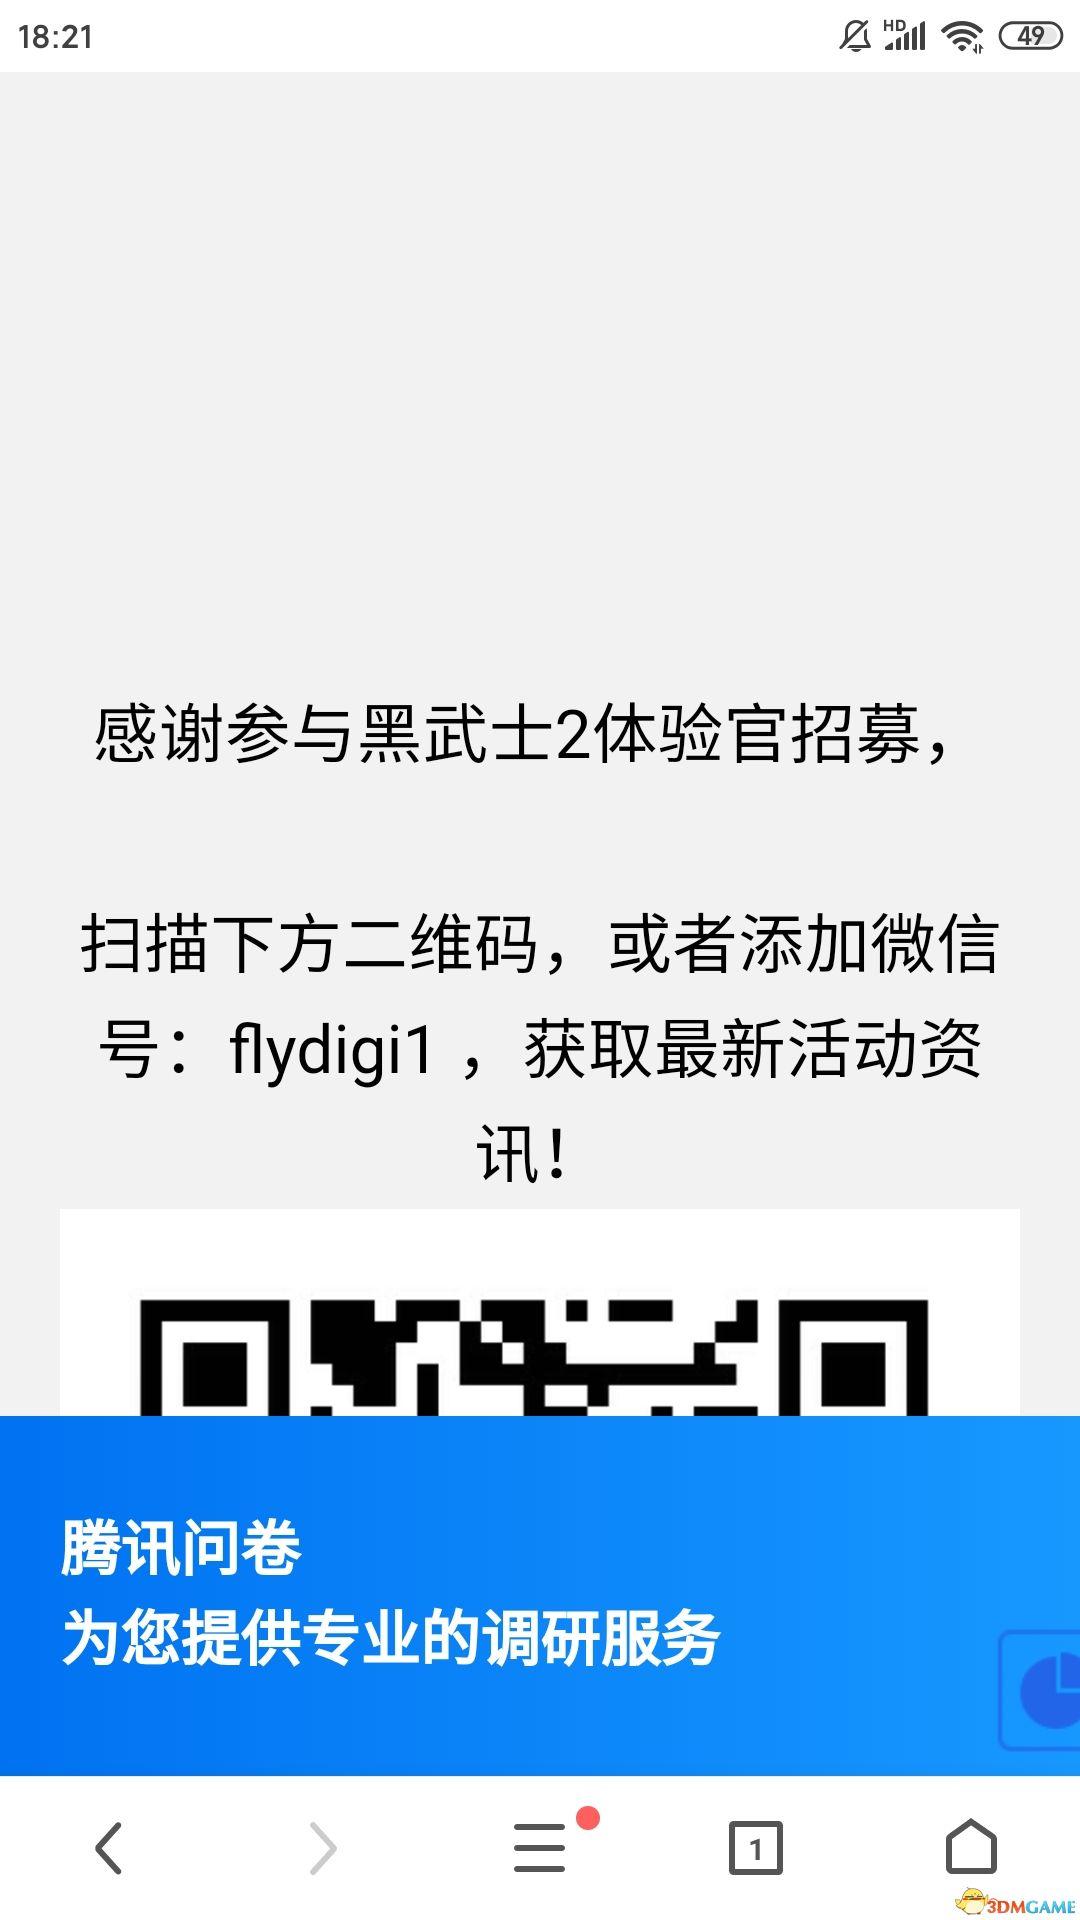 Screenshot_2020-12-22-18-21-21-039_com.qihoo.contents.jpg